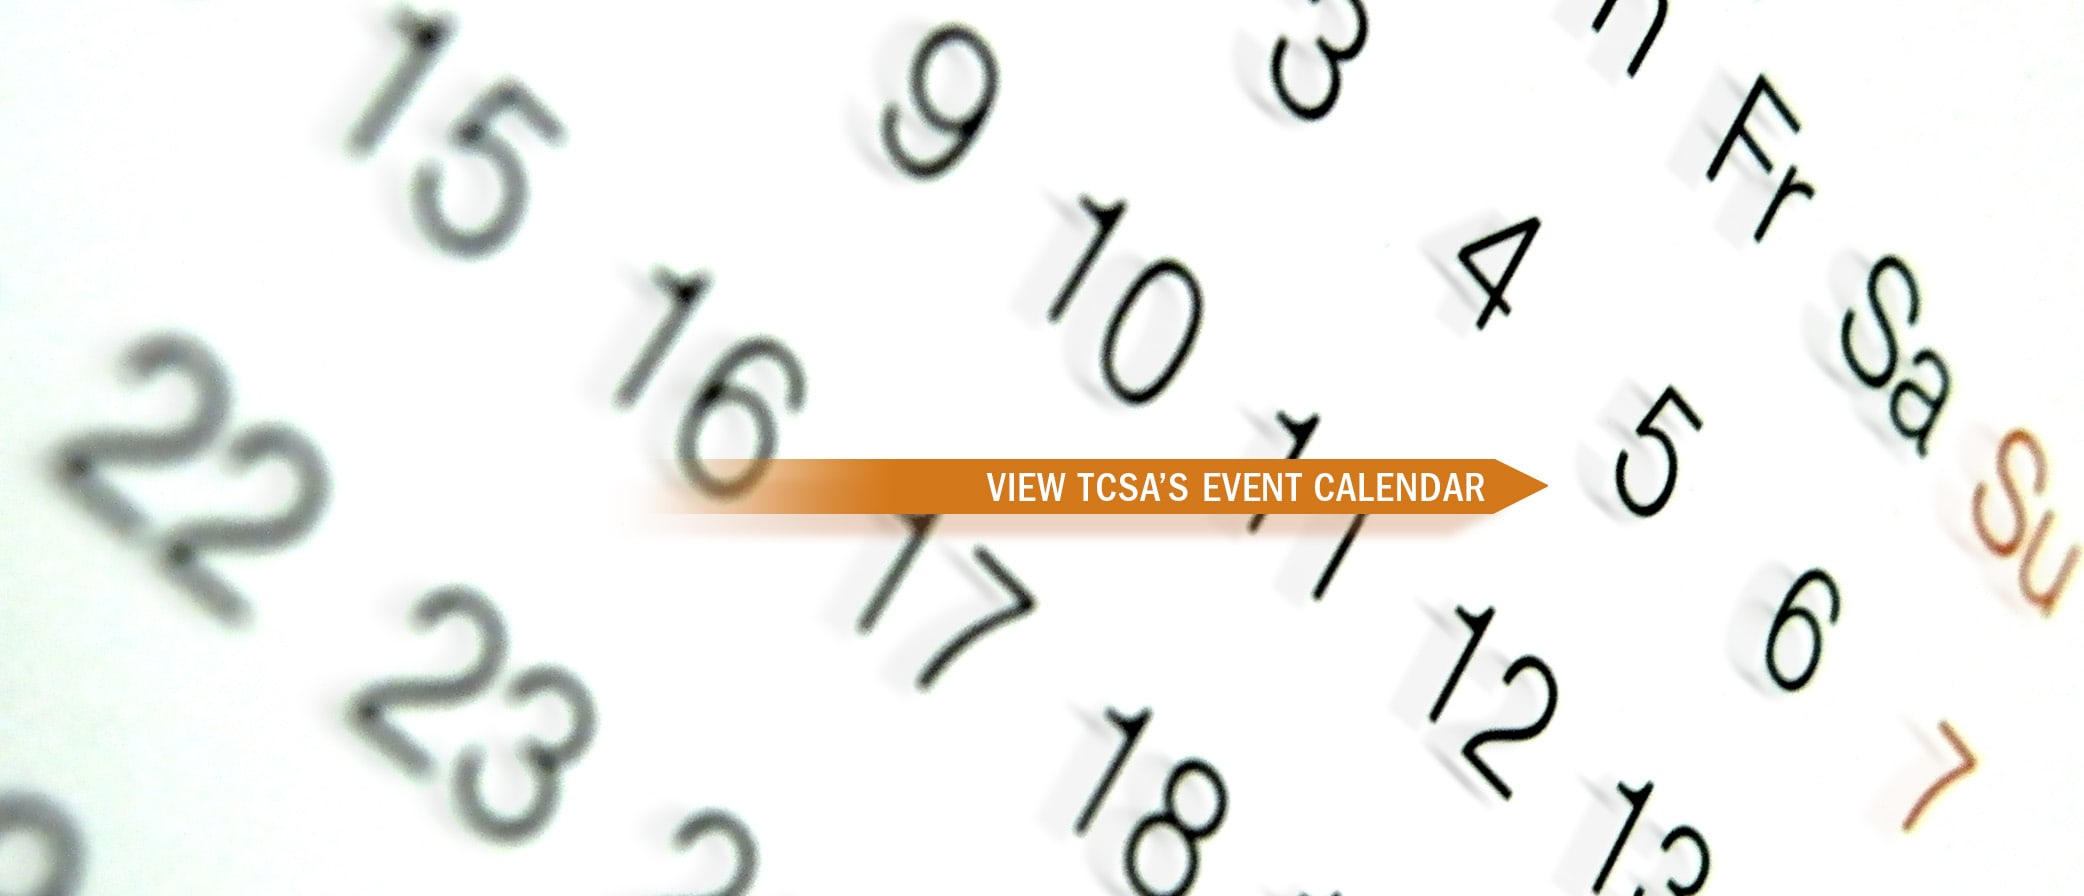 00880-Events-Calendar-Public-Website-rotating-banner_v1cb